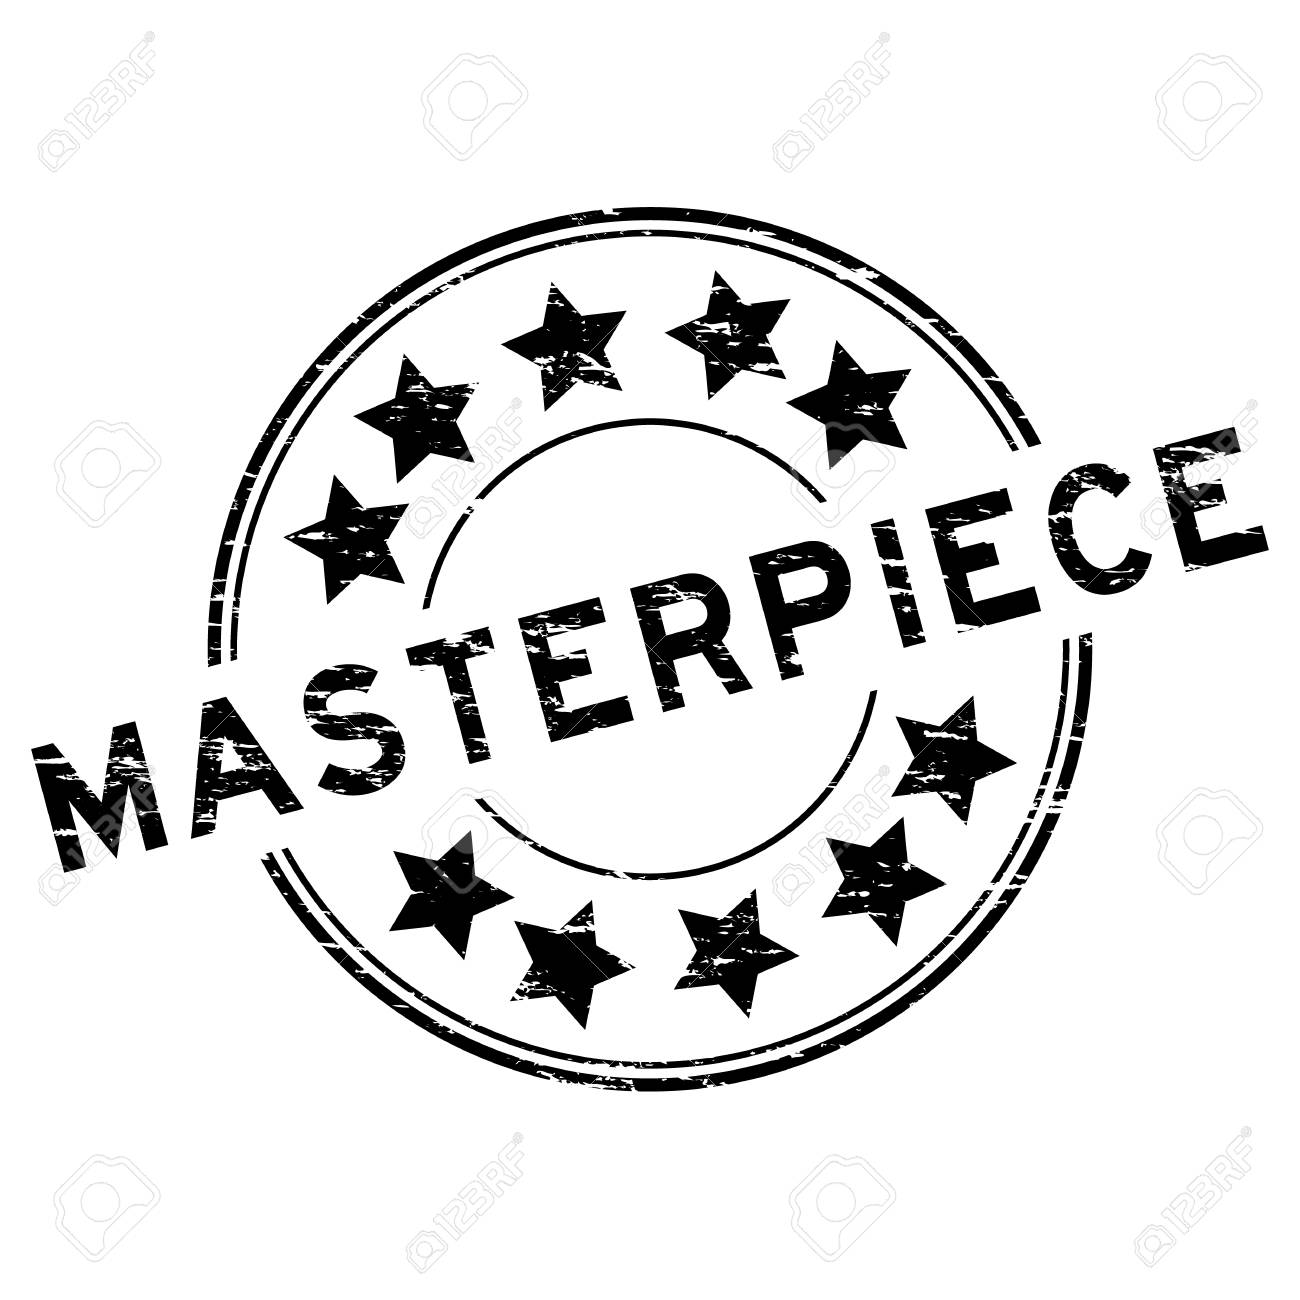 Grunge Black Masterpiece Round Rubber Stamp On White Background Stock Vector